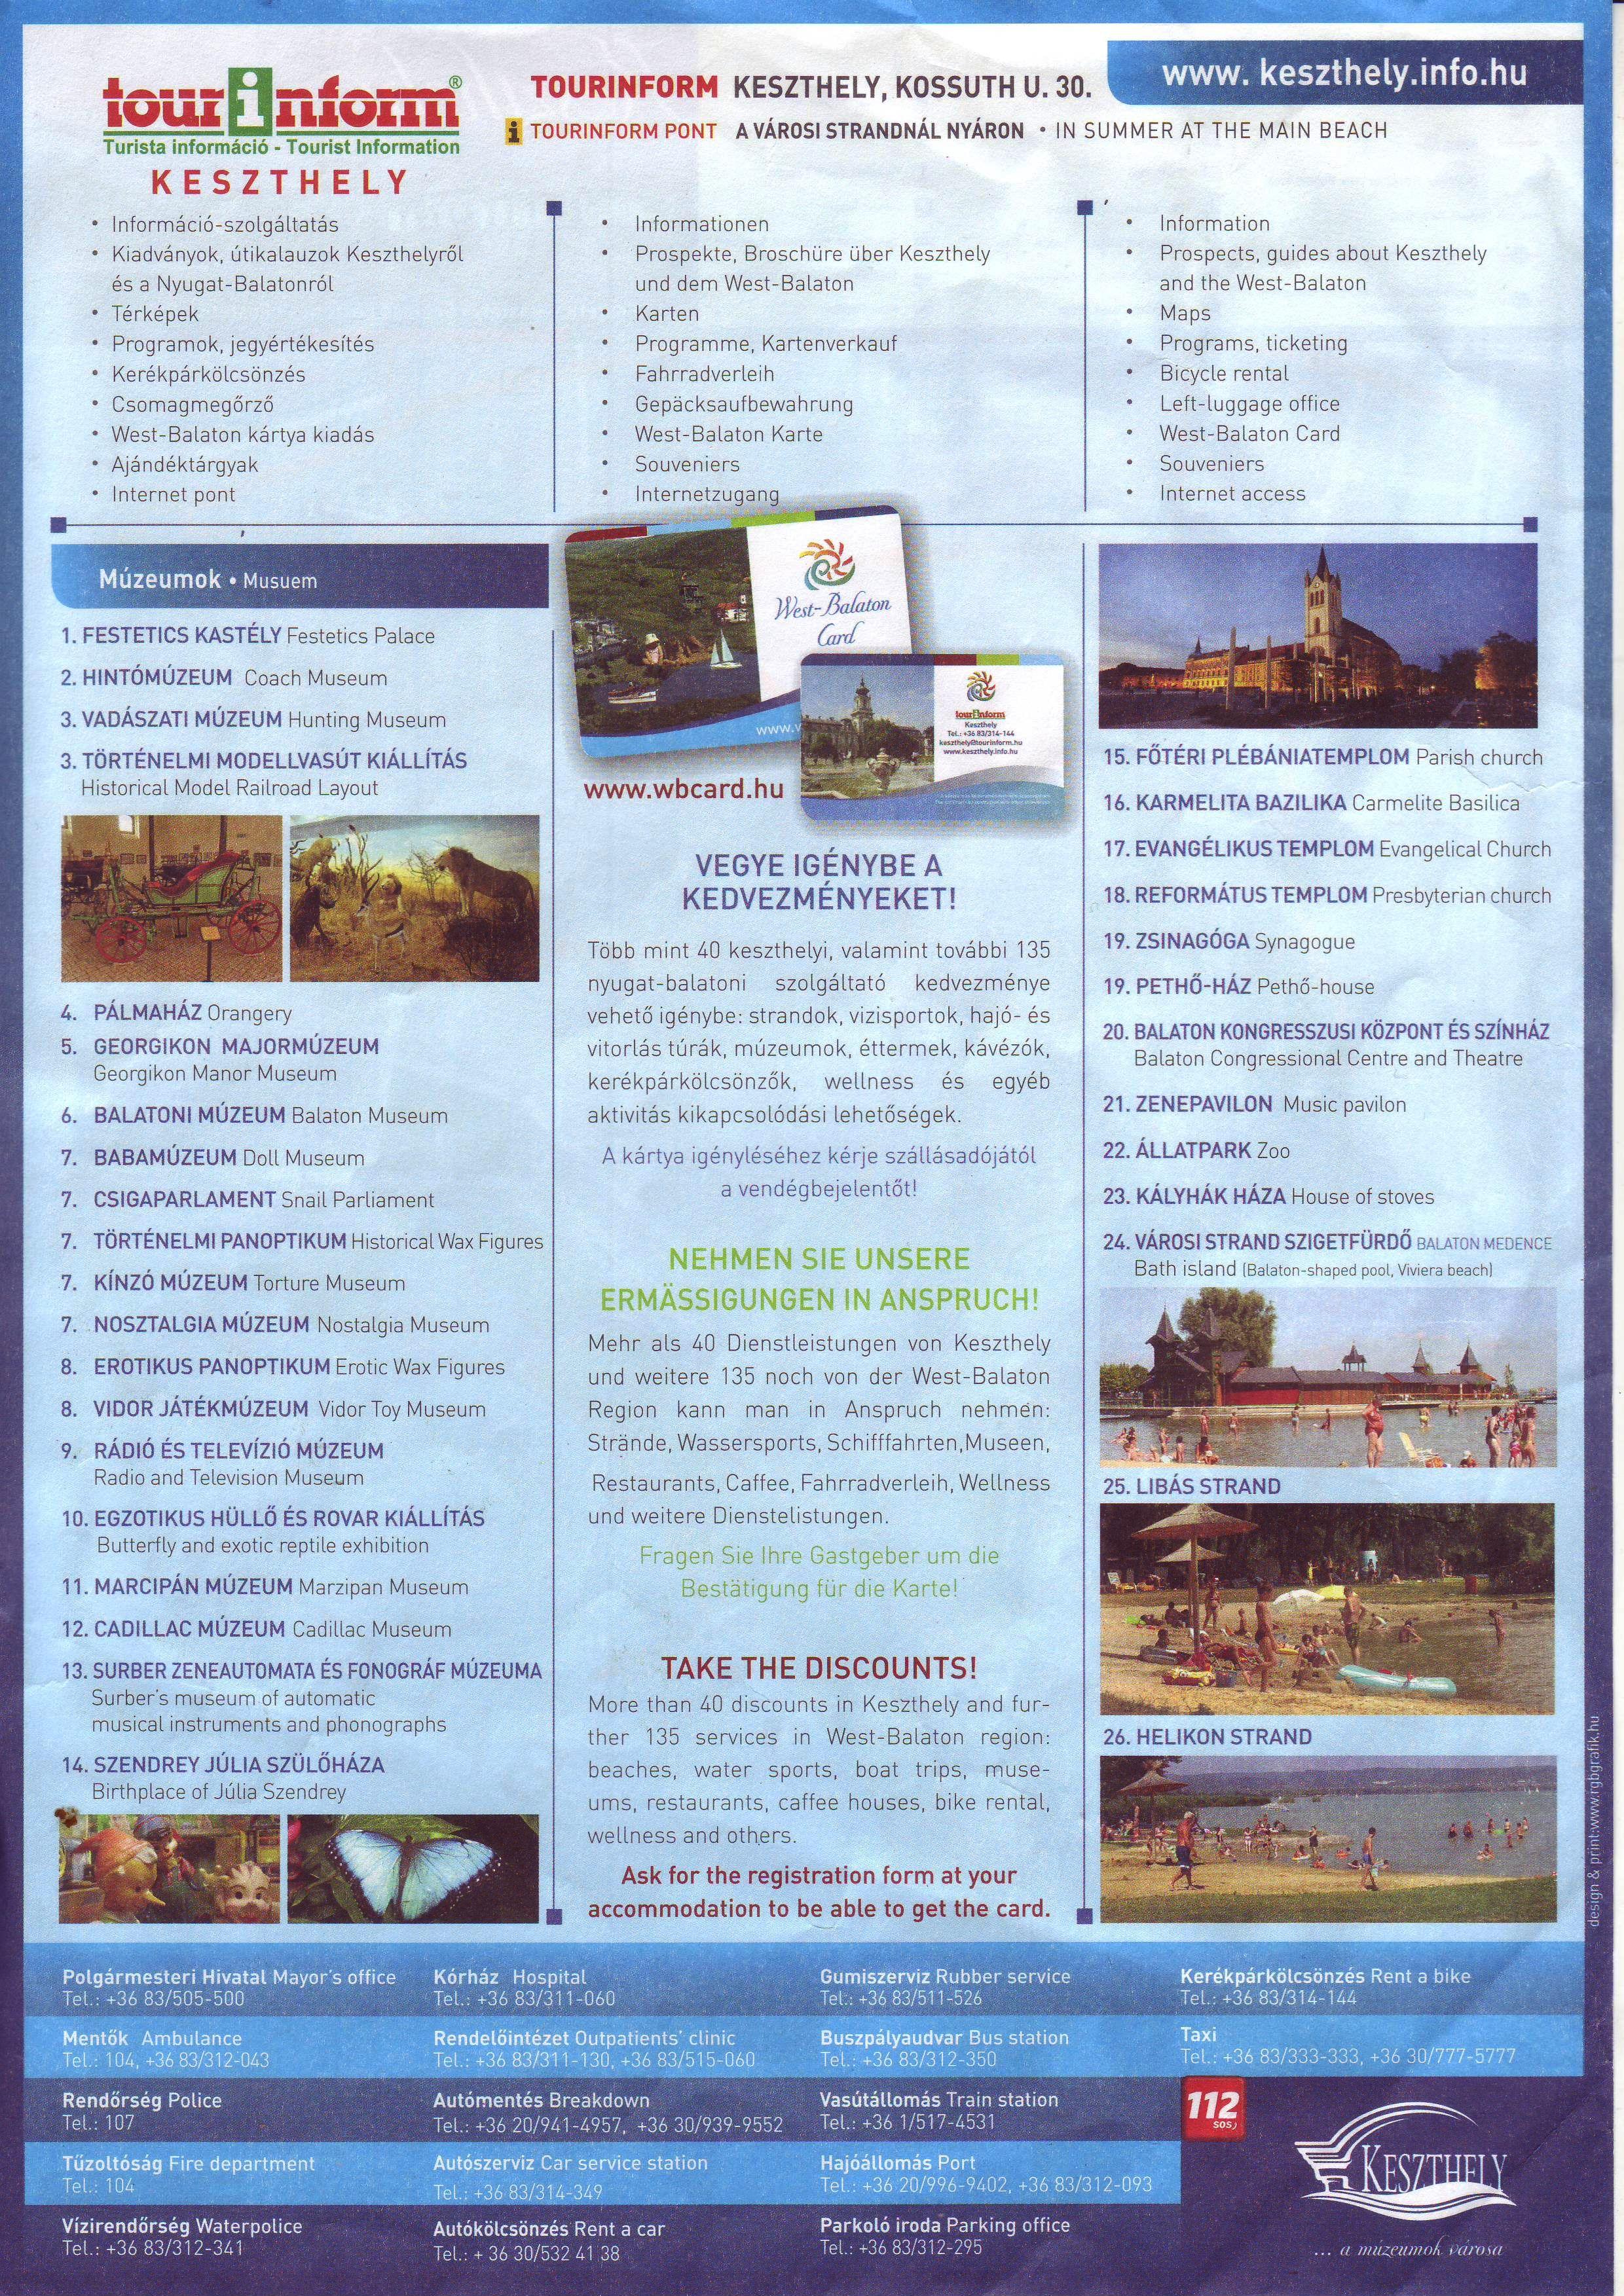 Keszthely Tourist Information